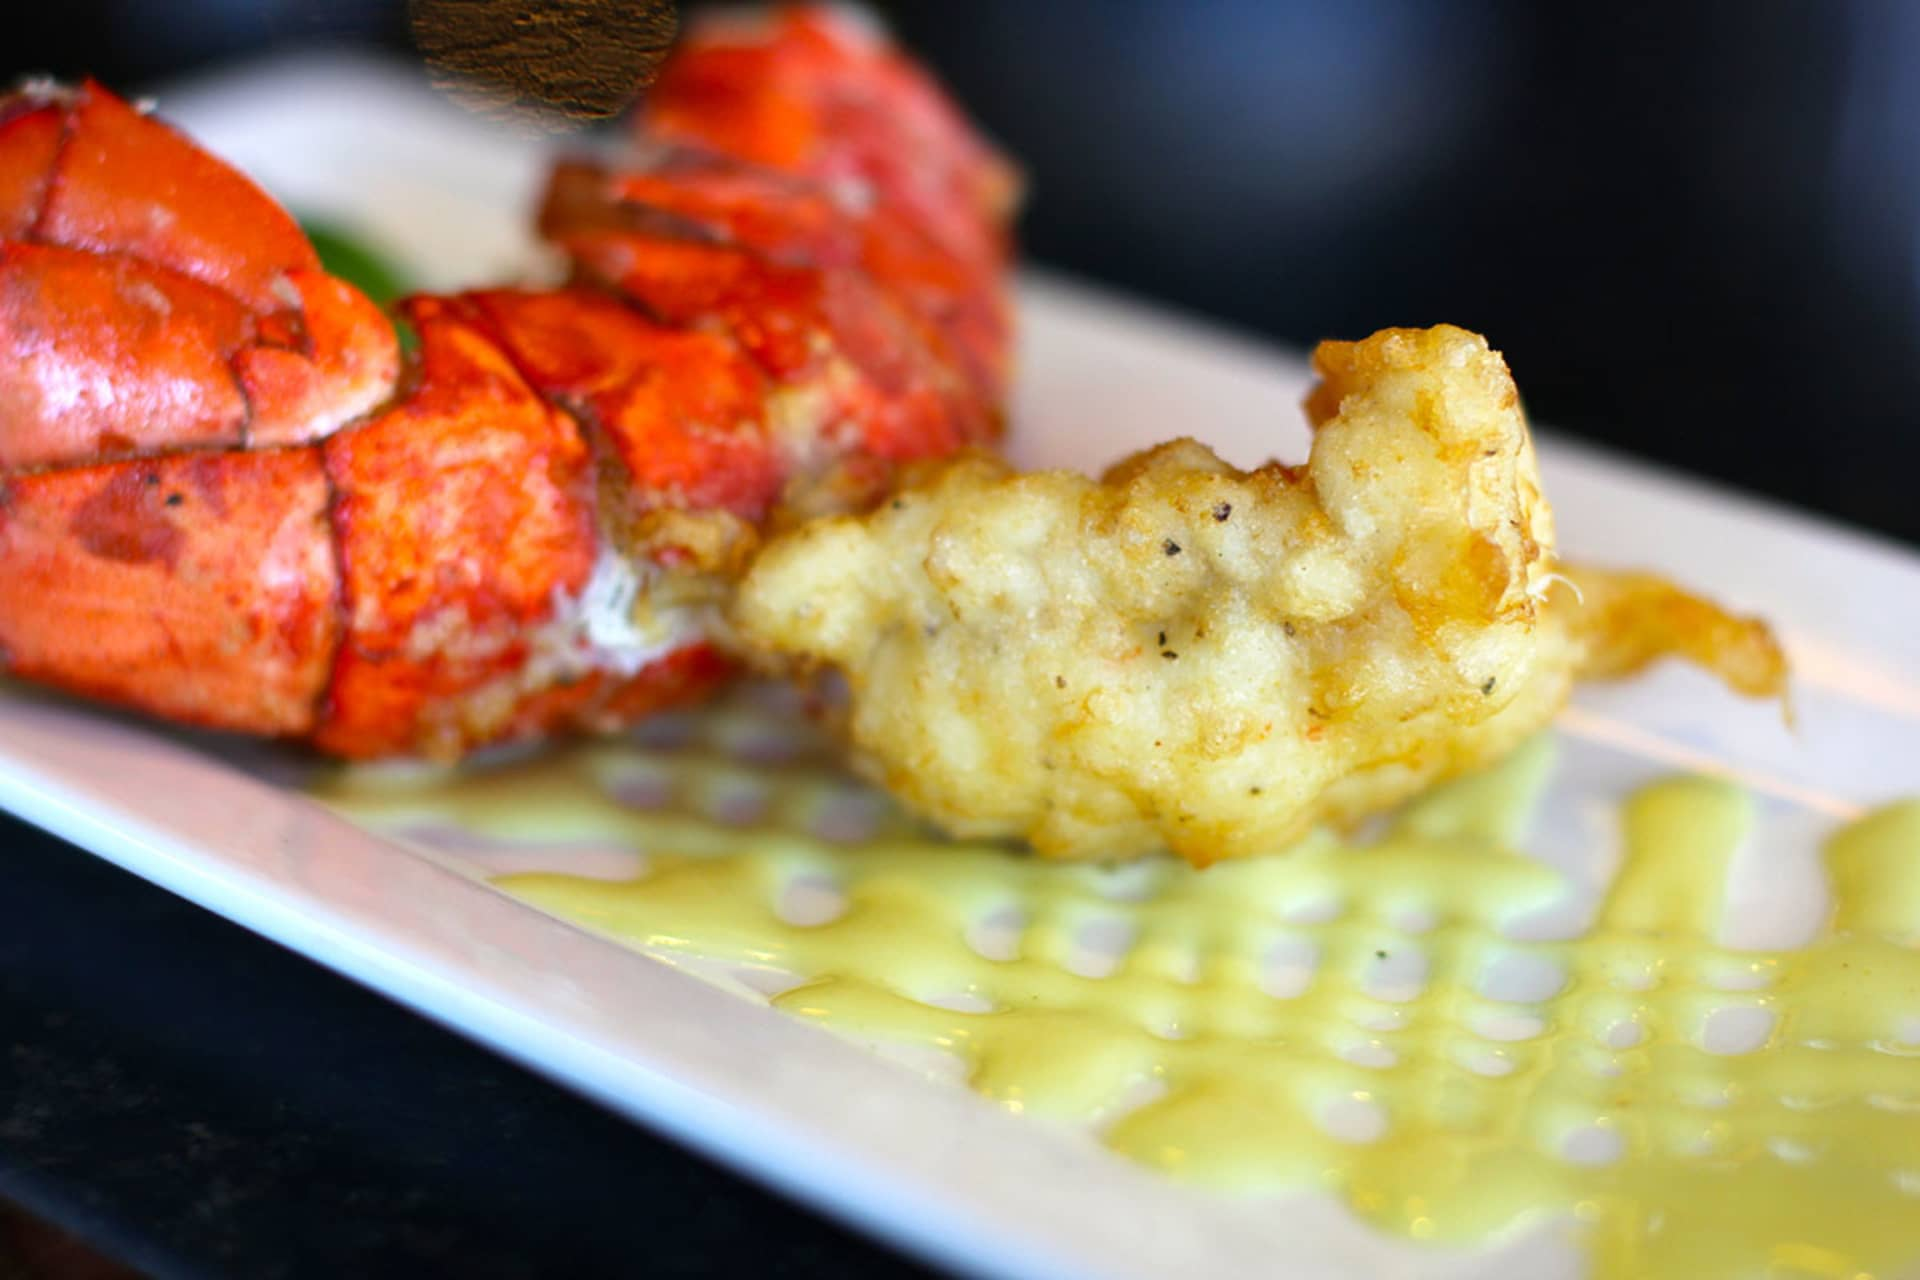 Tempura Fried Lobster Tail